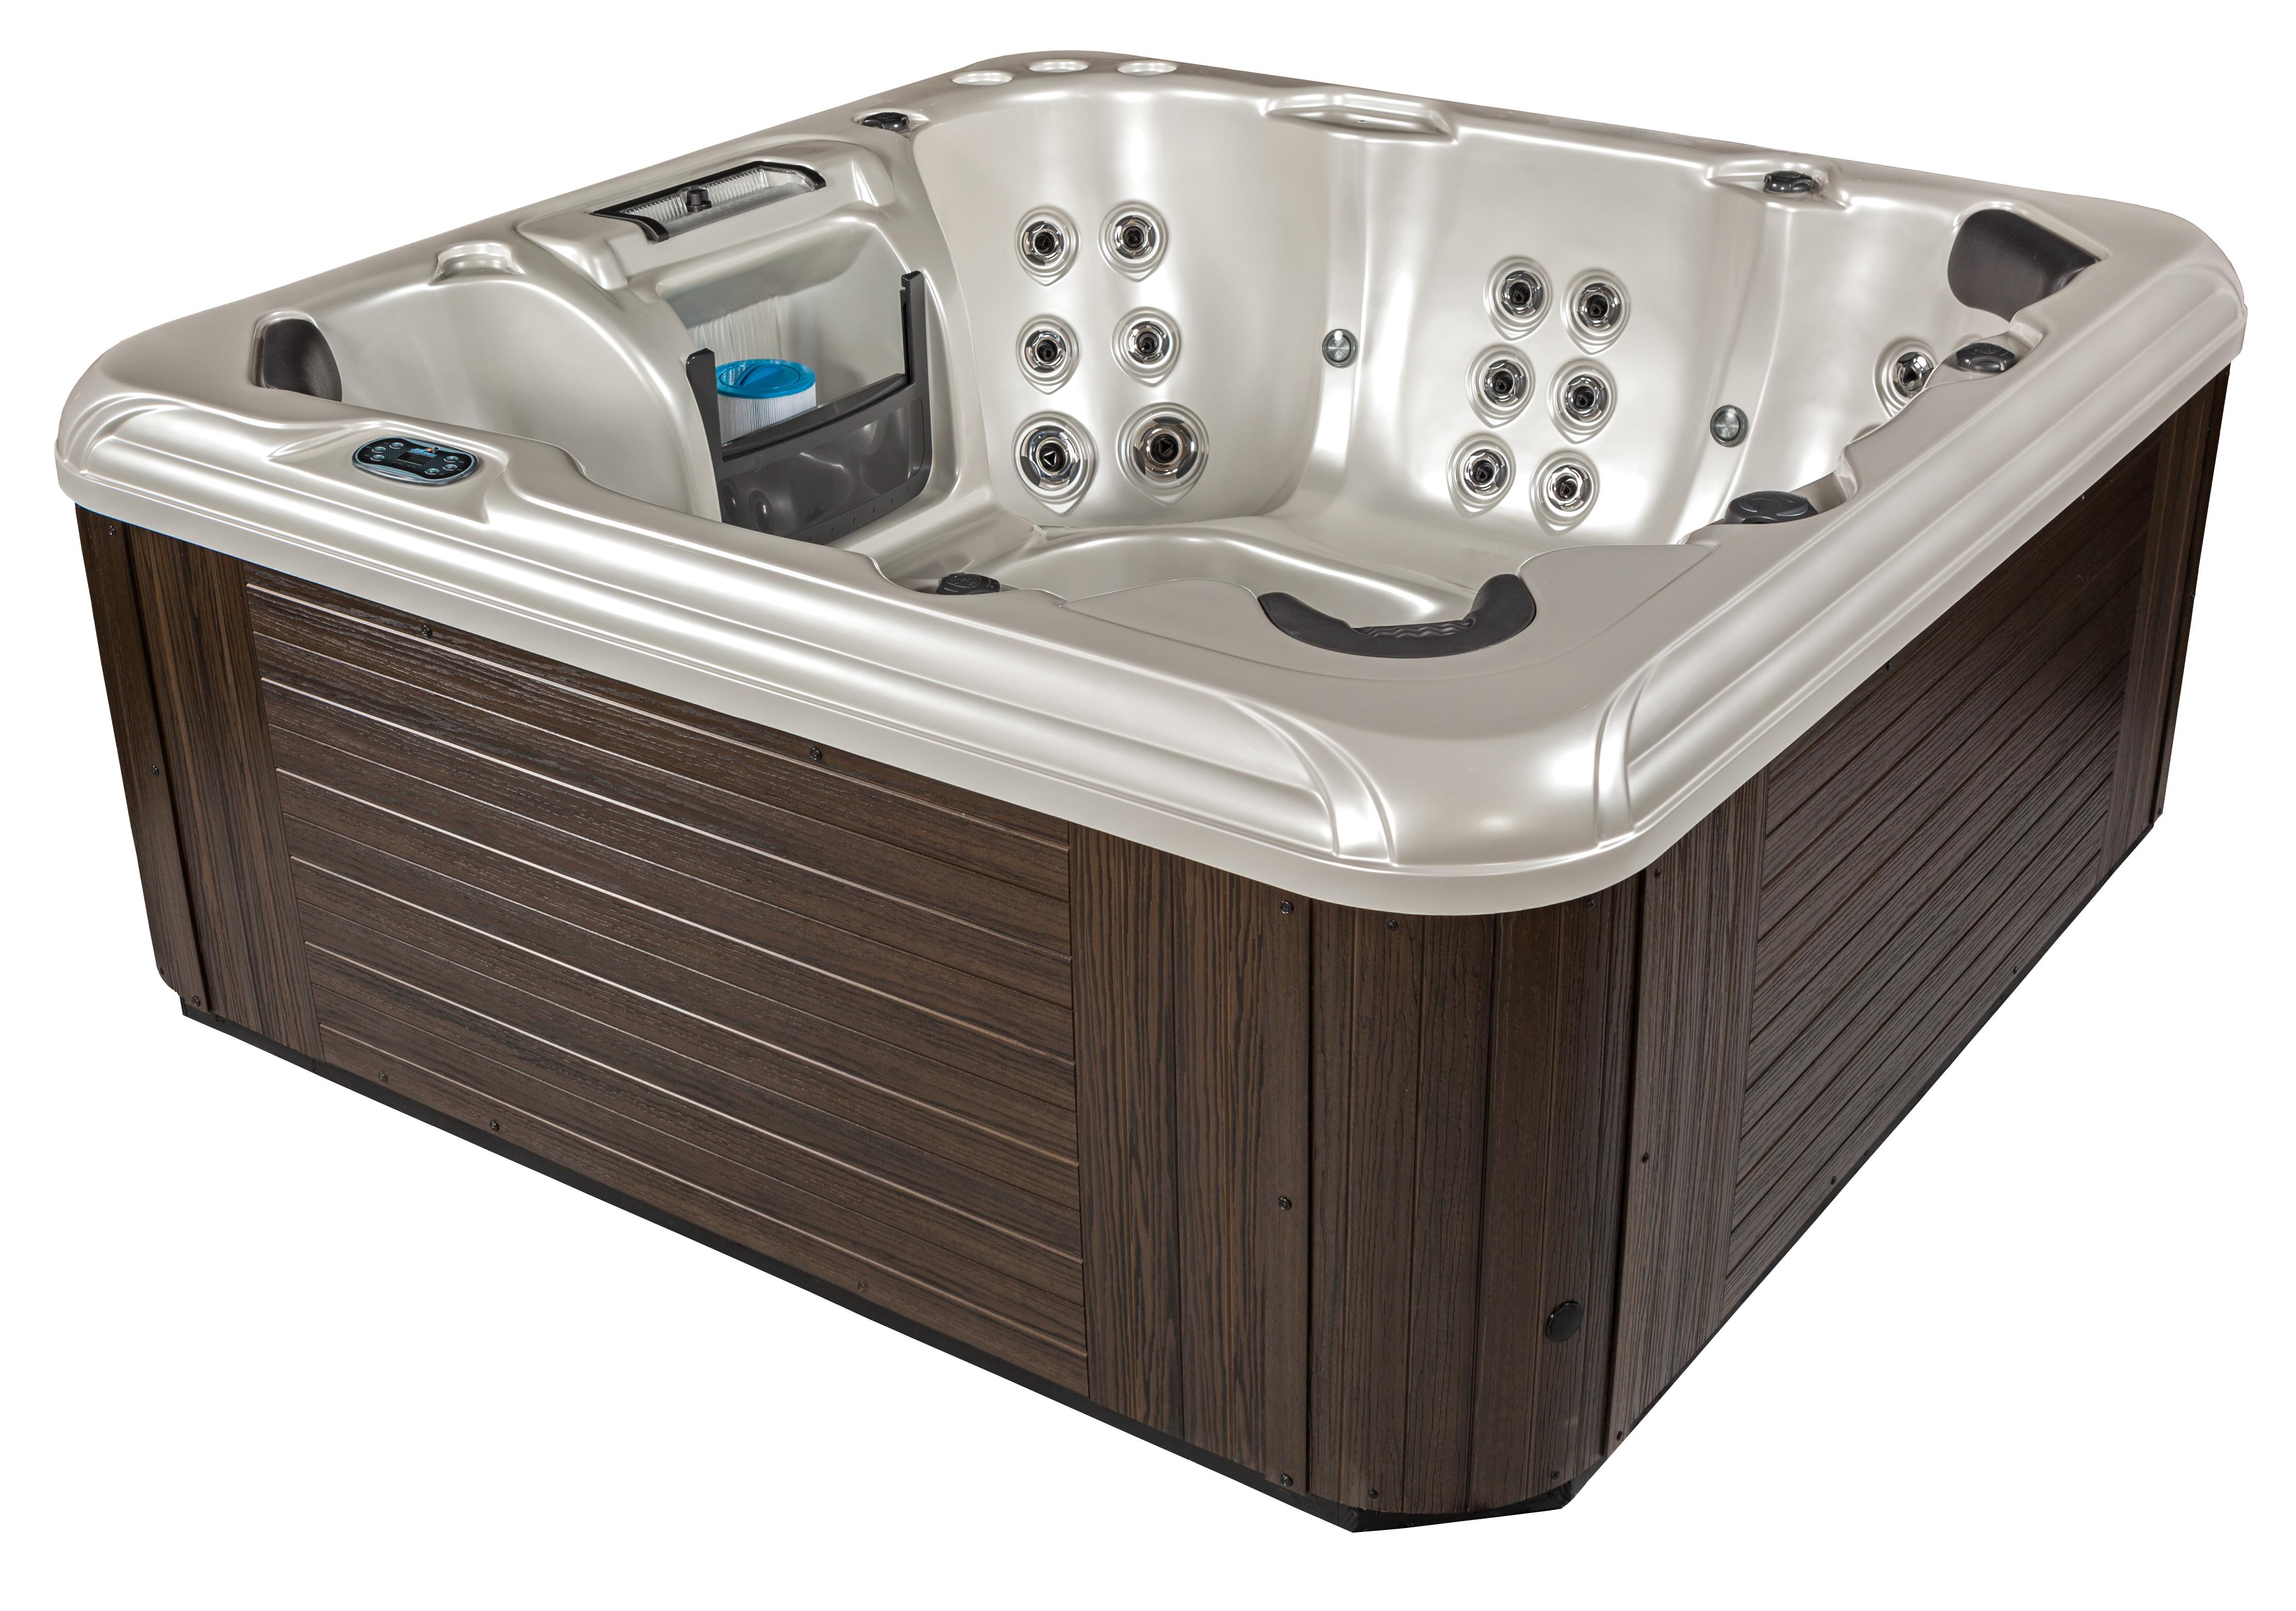 oahu-cabinet - Oceanside Hot Tub & Spa LLC